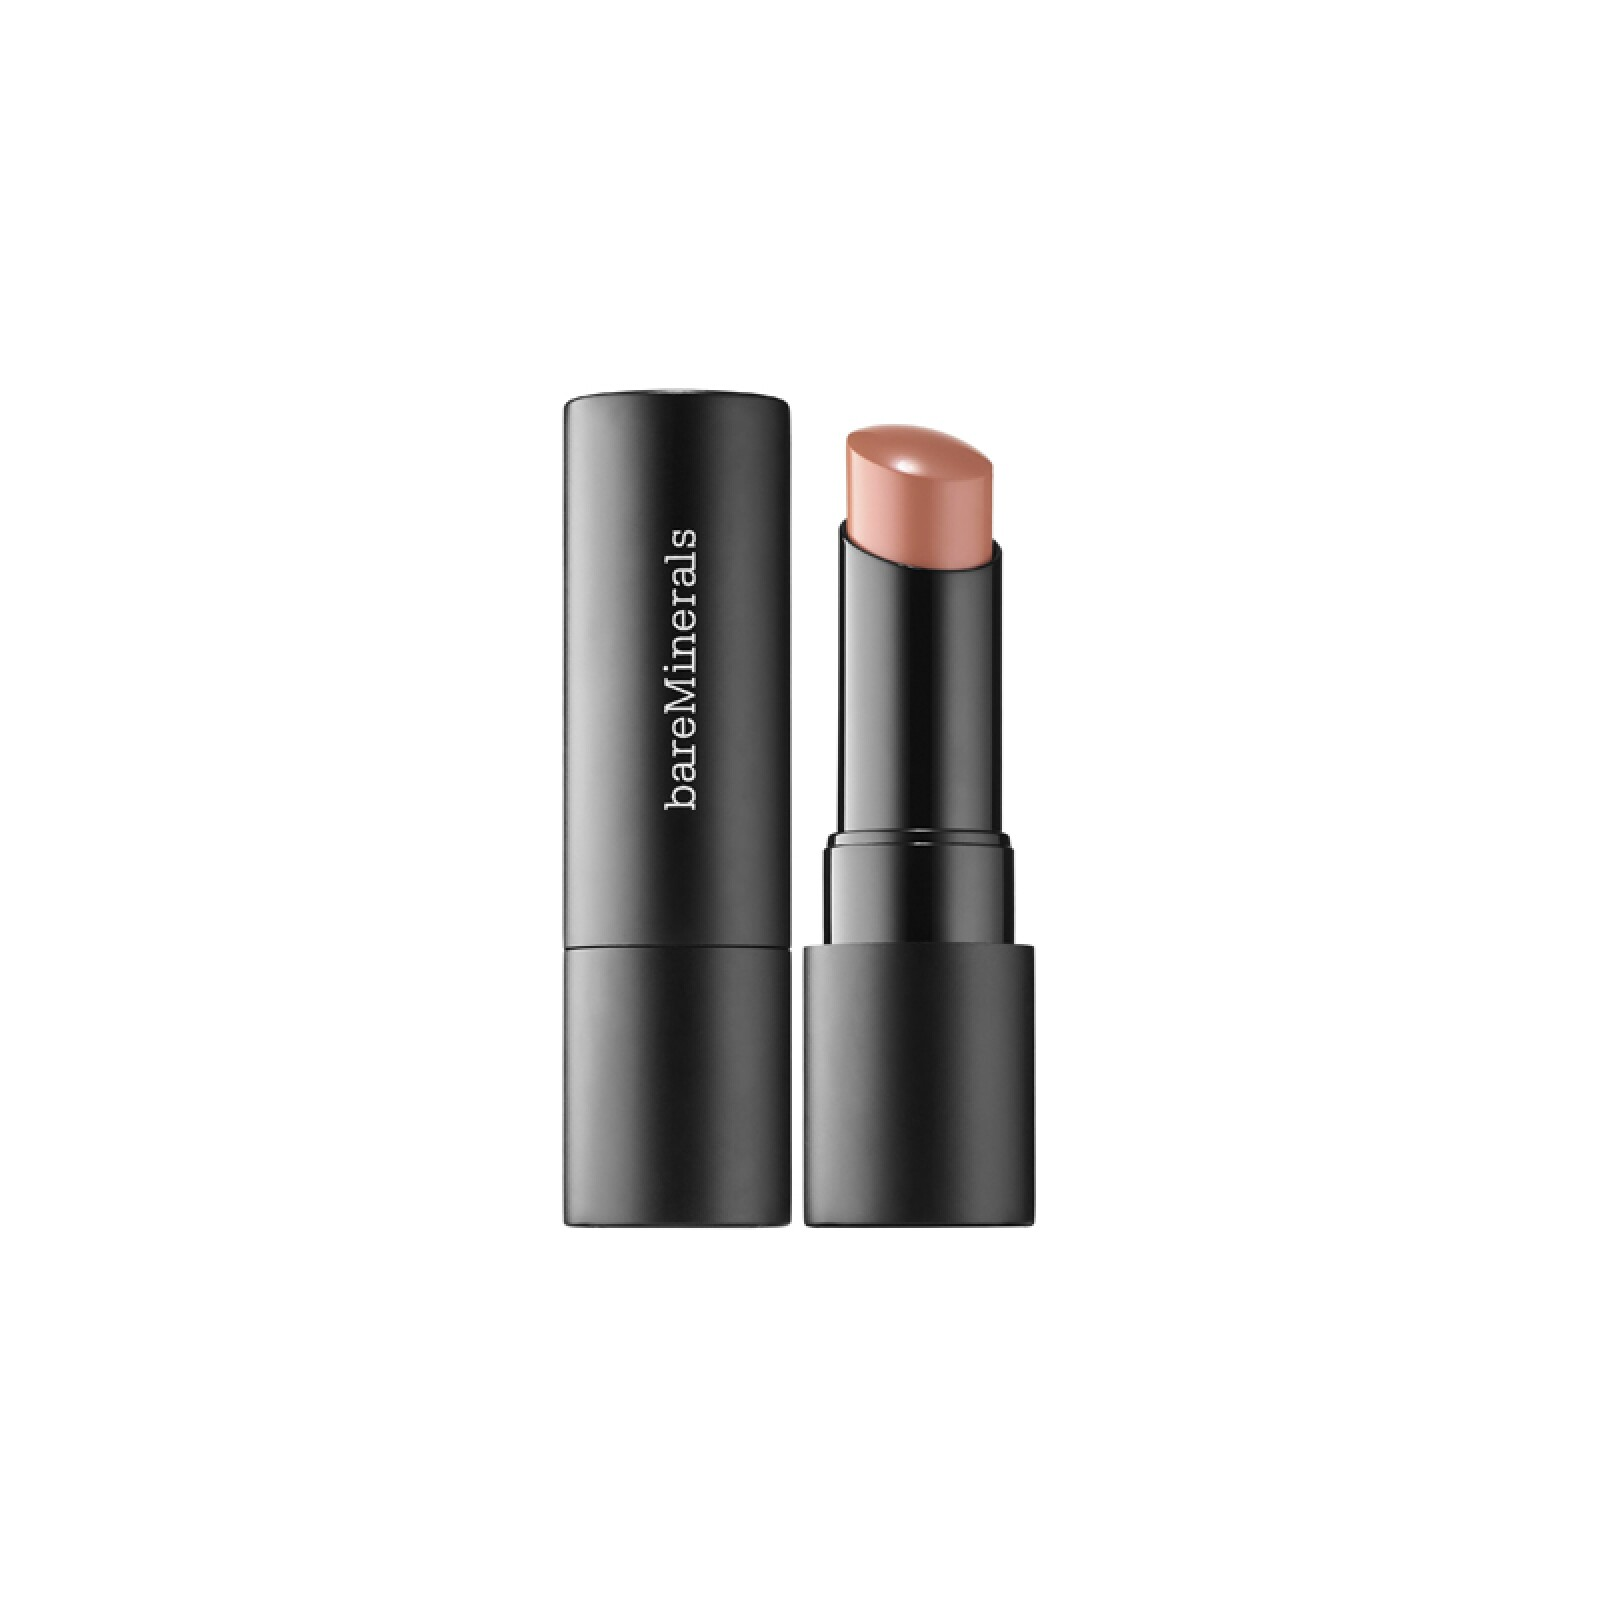 lipstick-barra de labios-labial-barato-maquillaje-bareminerals